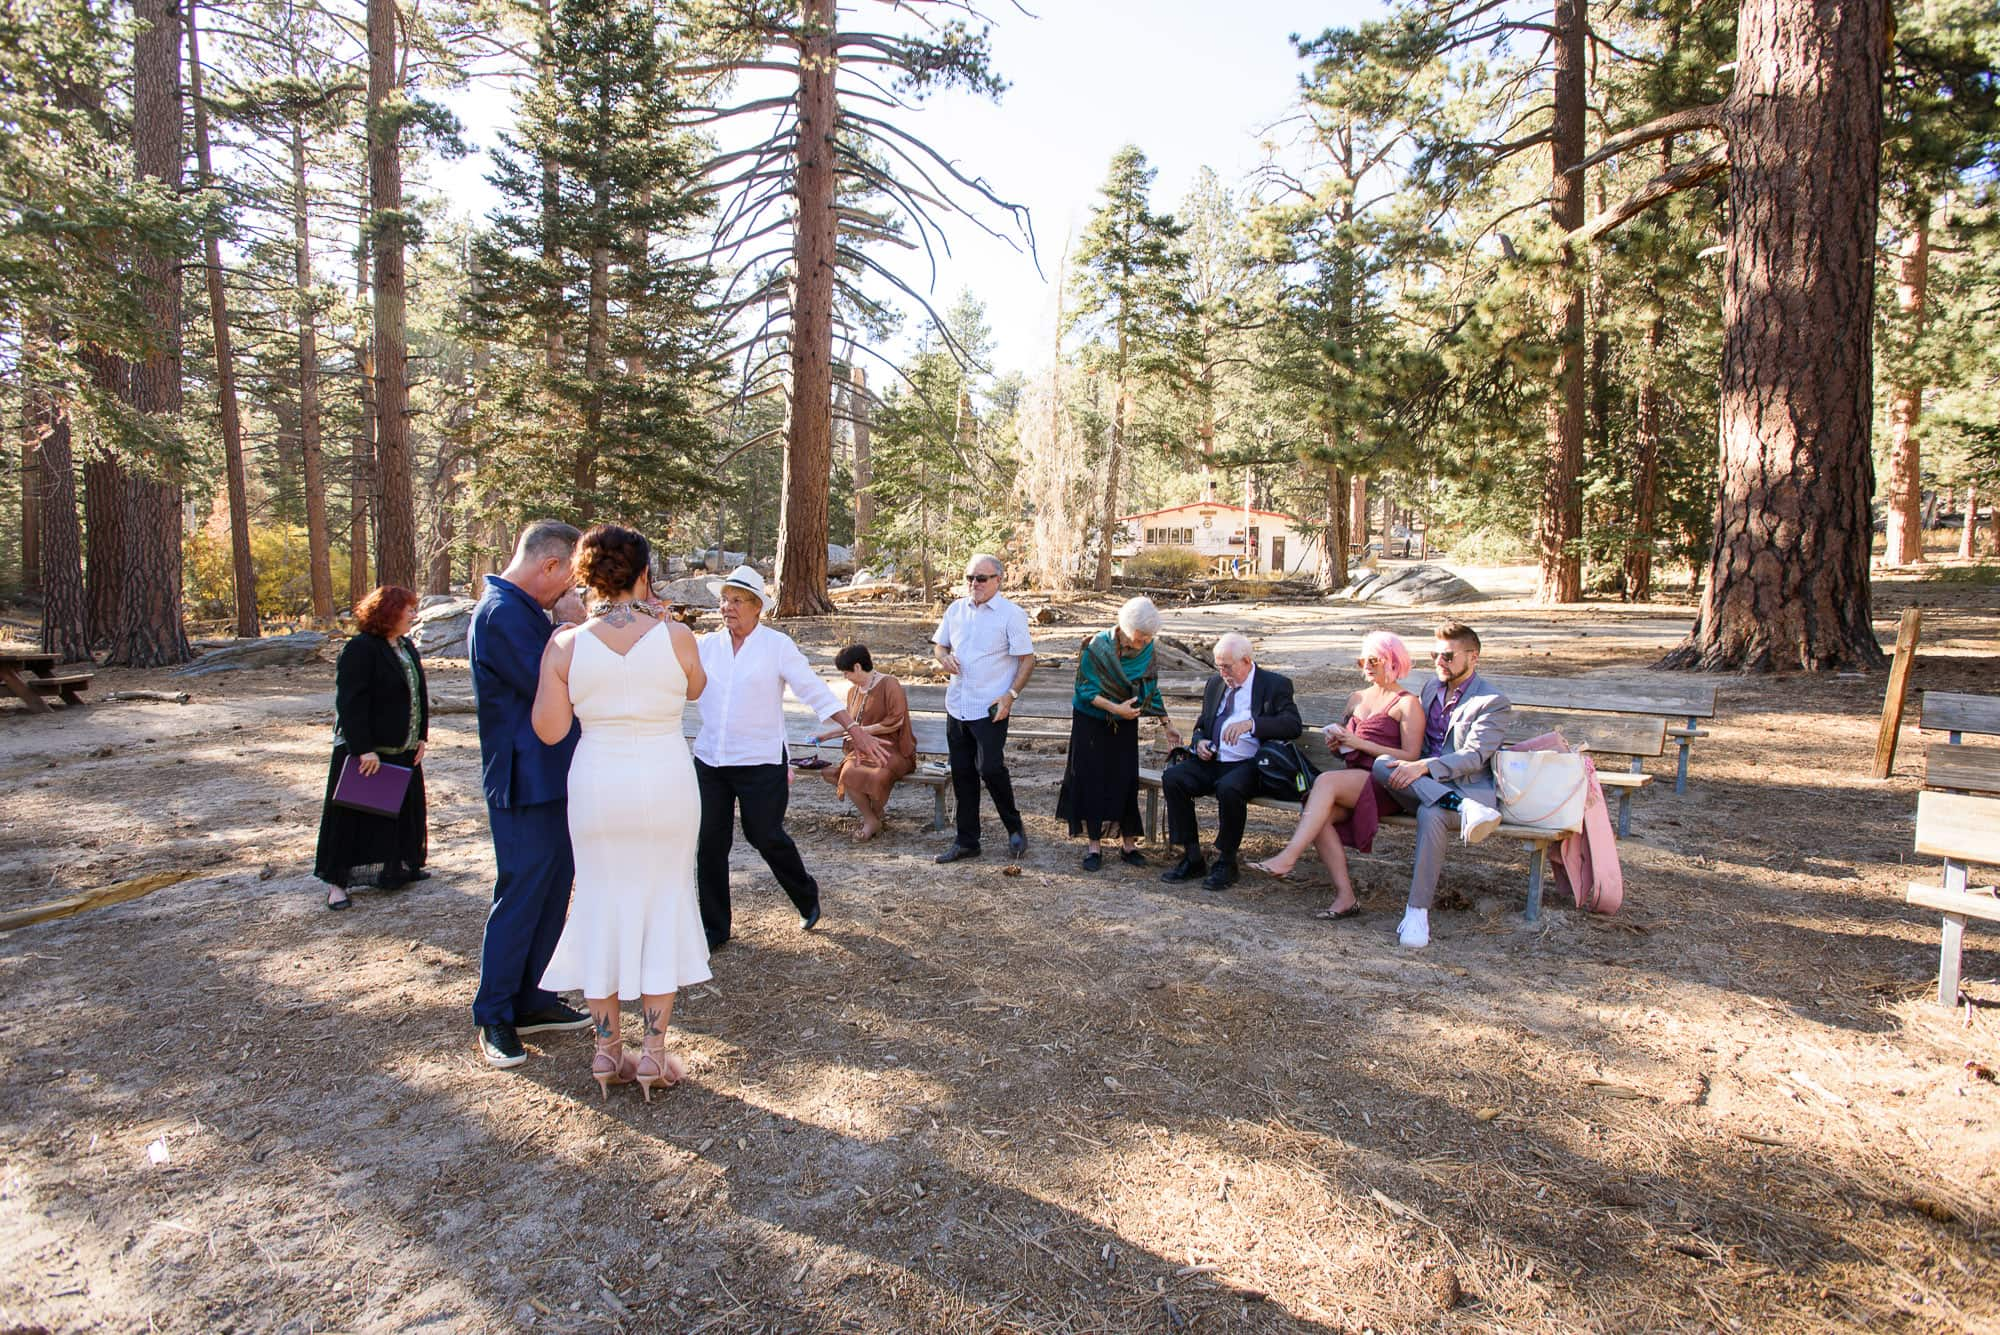 027_Alan_and_Heidi_Palm_Springs_Tram_Wedding